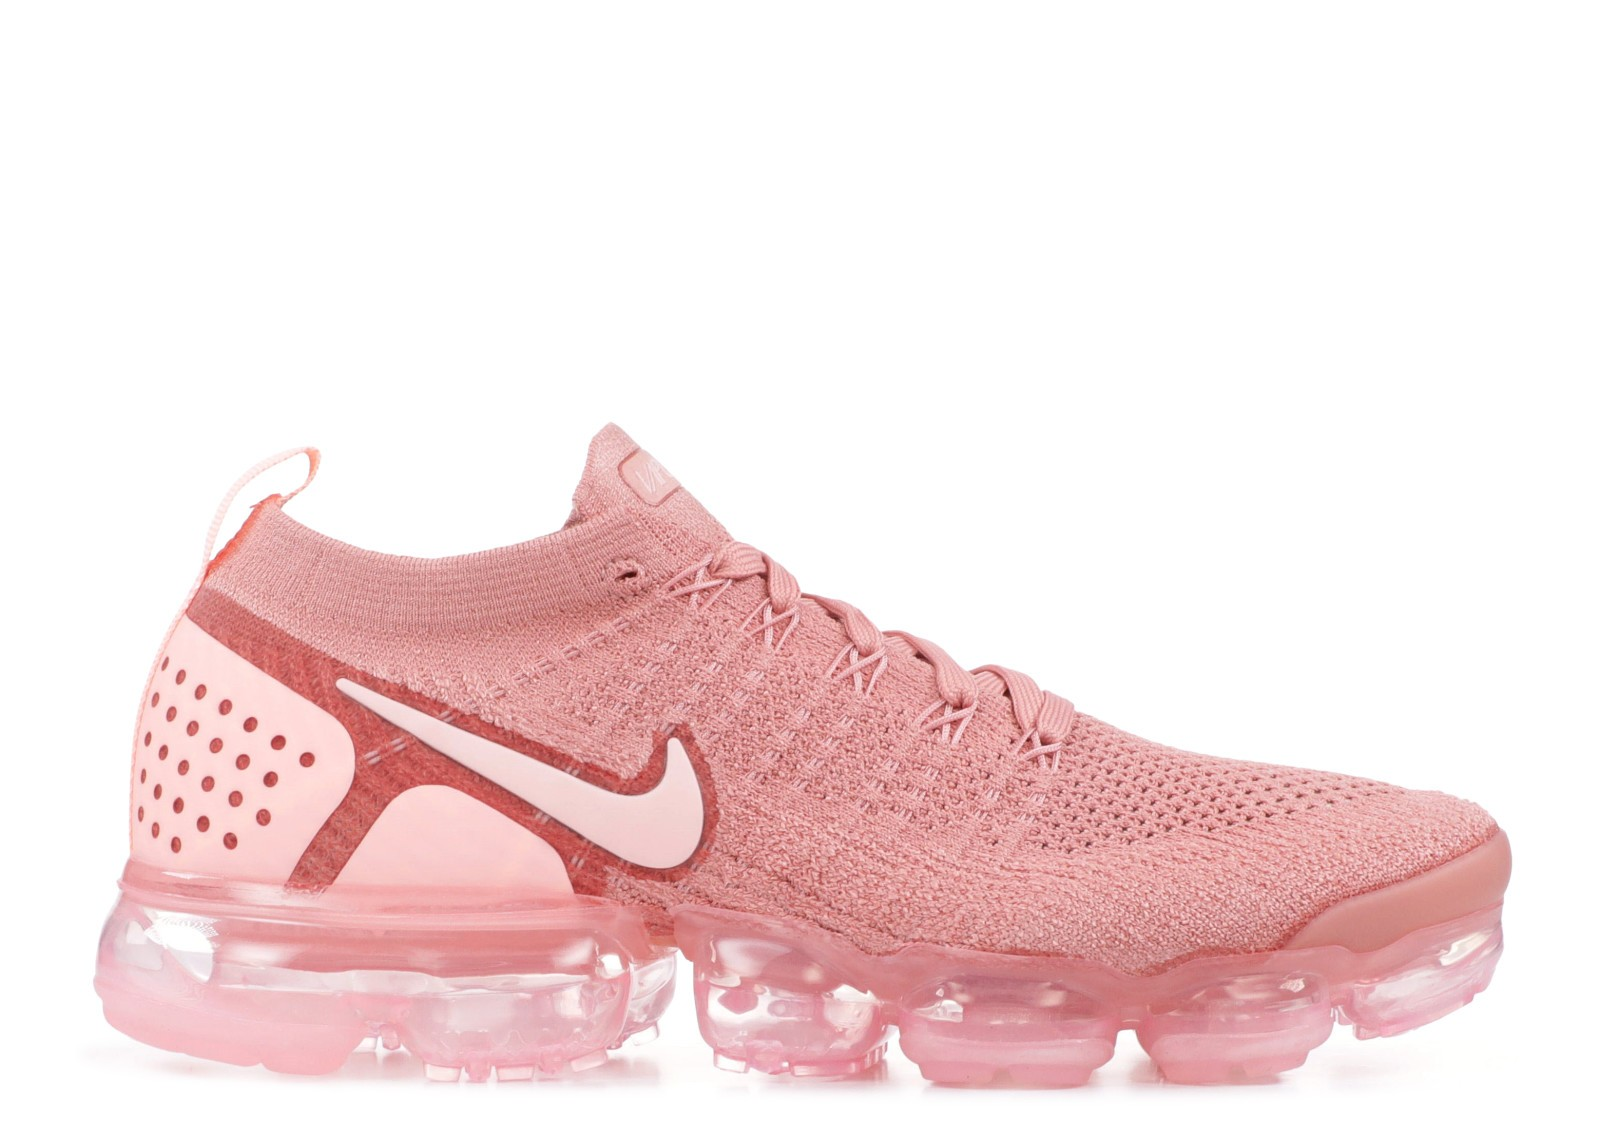 f52d5d02530 Prev W Nike Air Vapormax Flyknit 2.0 Rust Pink Pink Tint Storm Rust 942843- 600